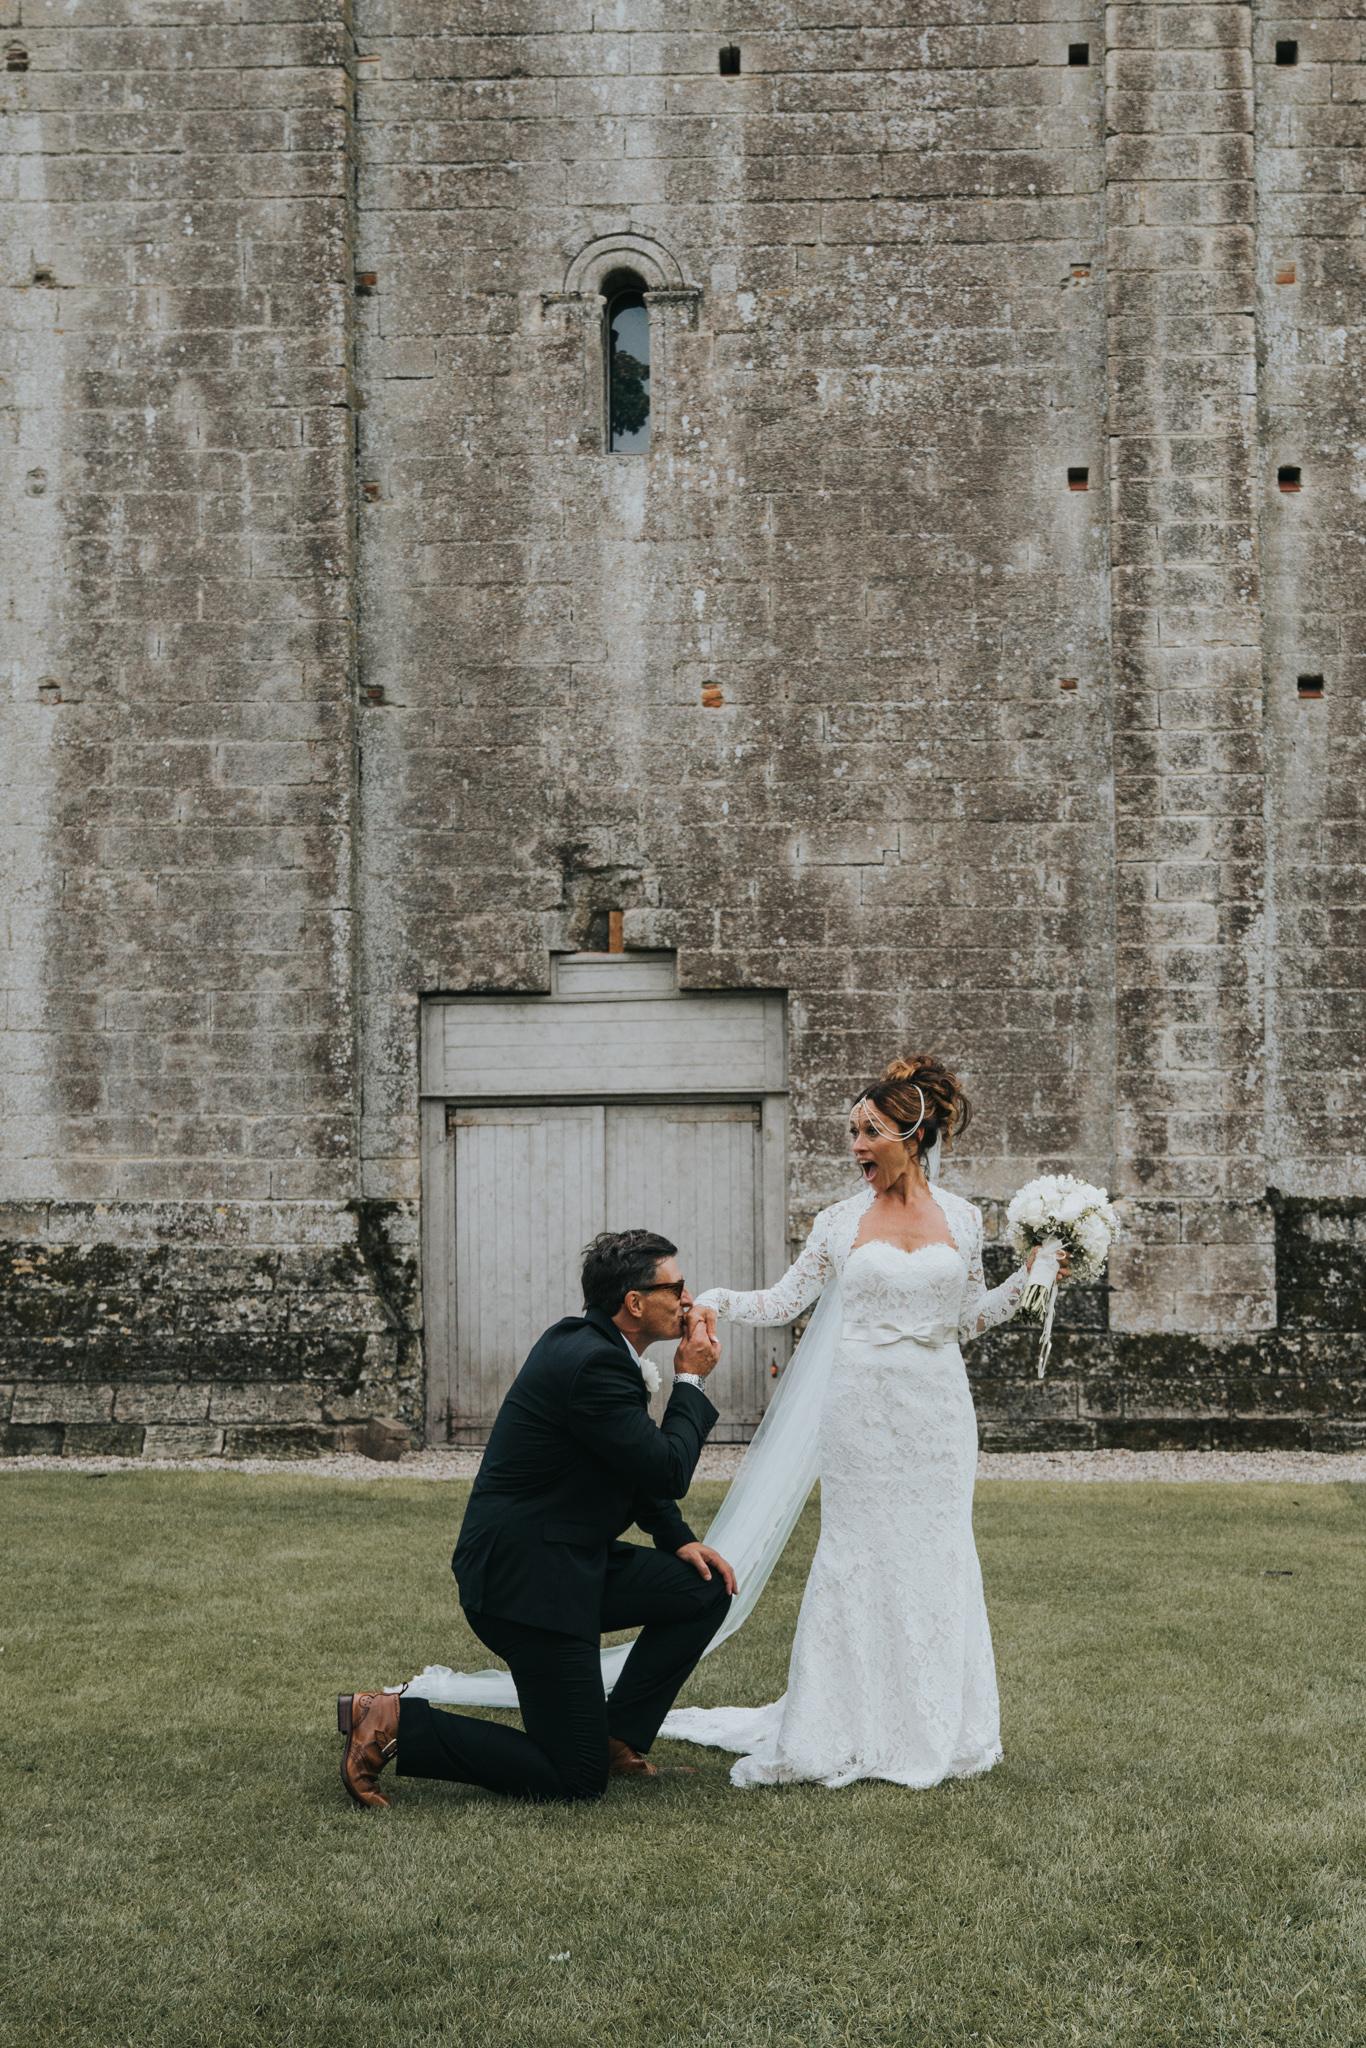 grace-elizabeth-boho-wedding-headingham-castle-essex-wedding-photographer-64.jpg